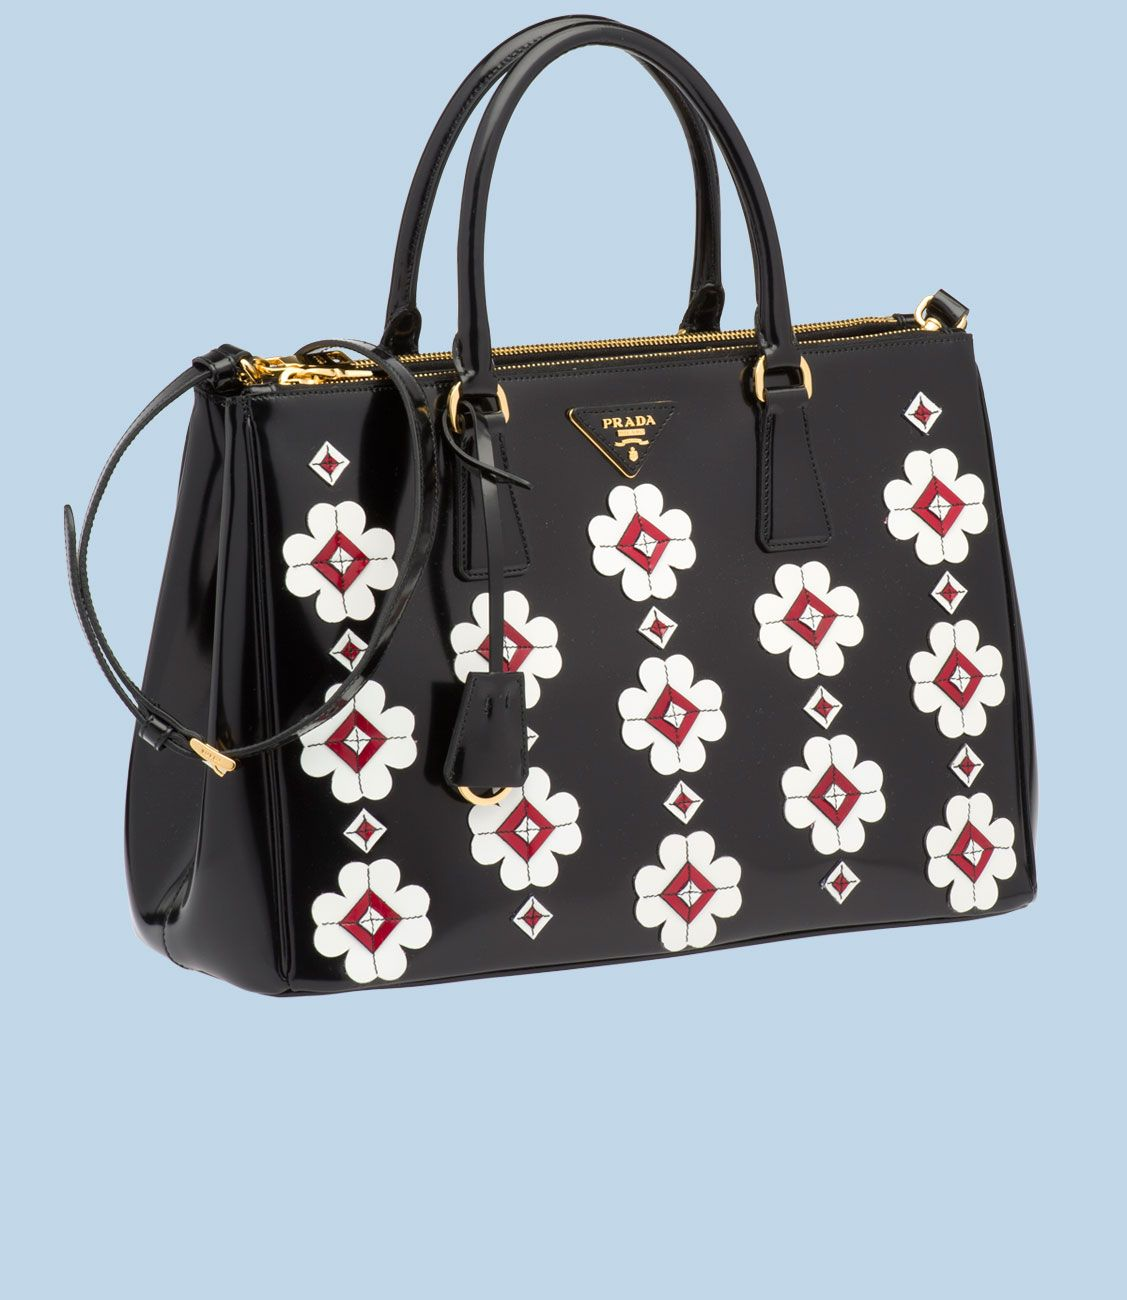 60c9e815f prada box purse flower - Google Search | Love it!!! | Prada bag ...